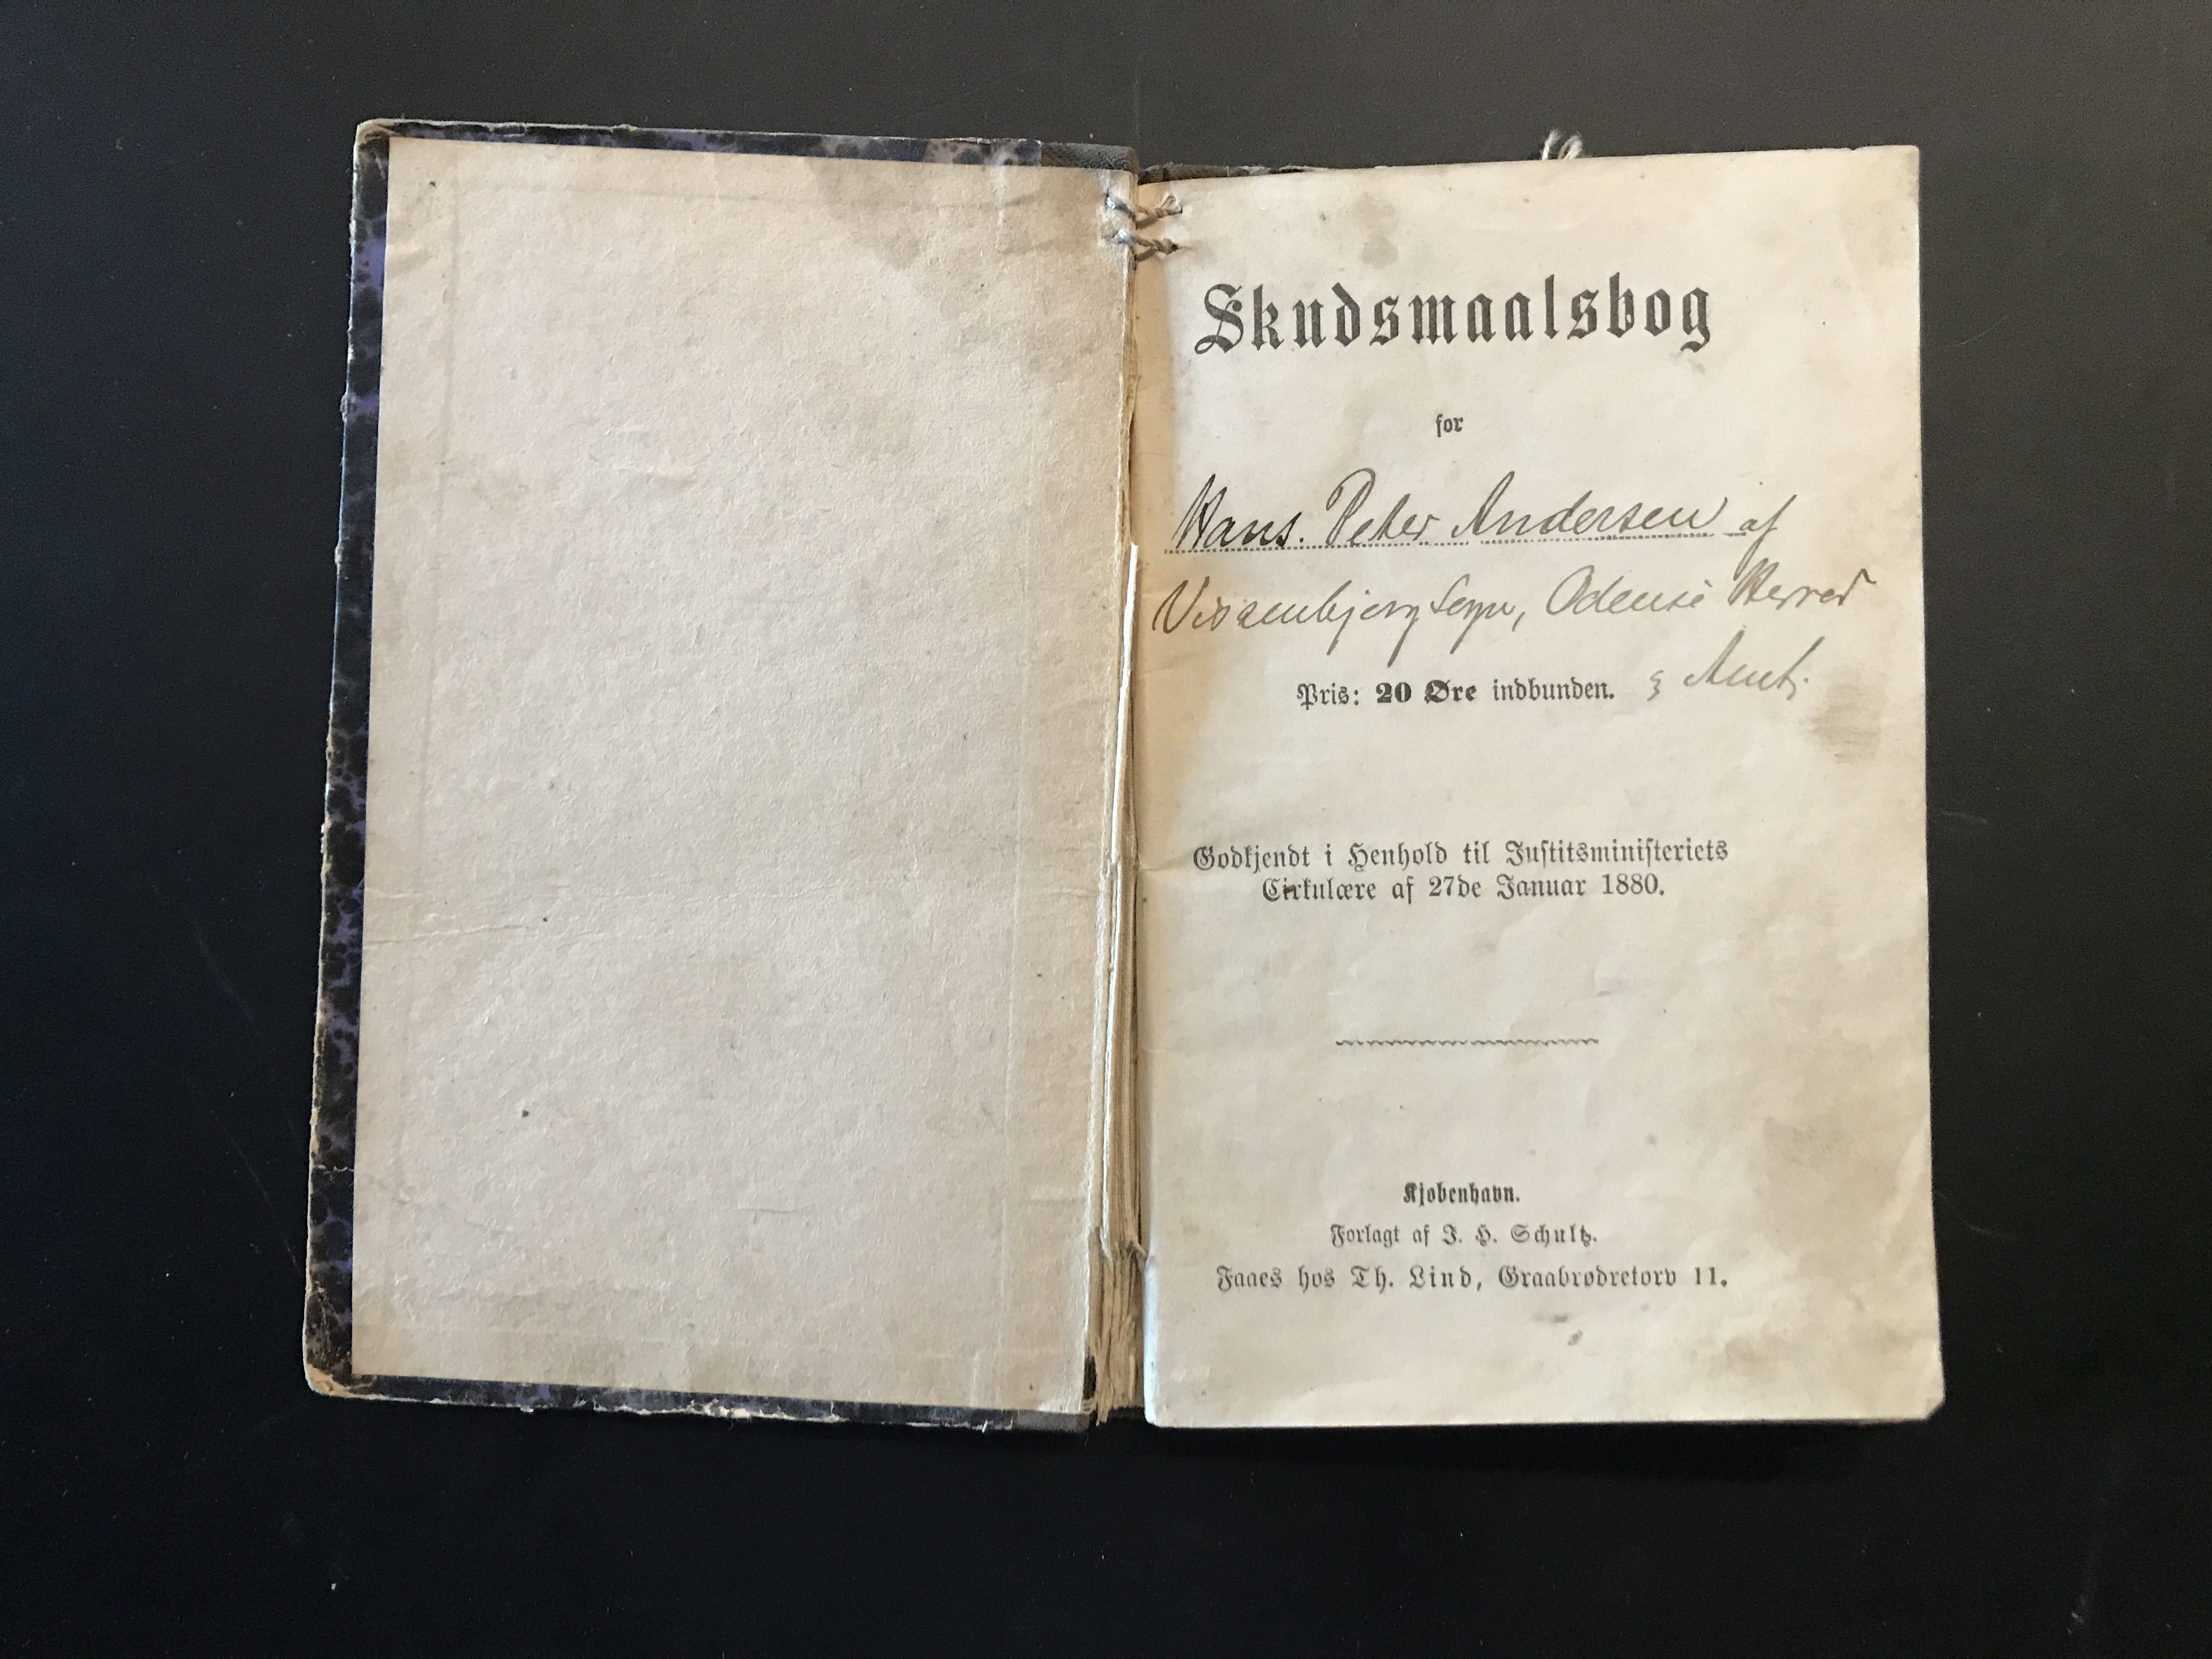 Et 100 år gammelt CV – min oldefars skudsmålsbog